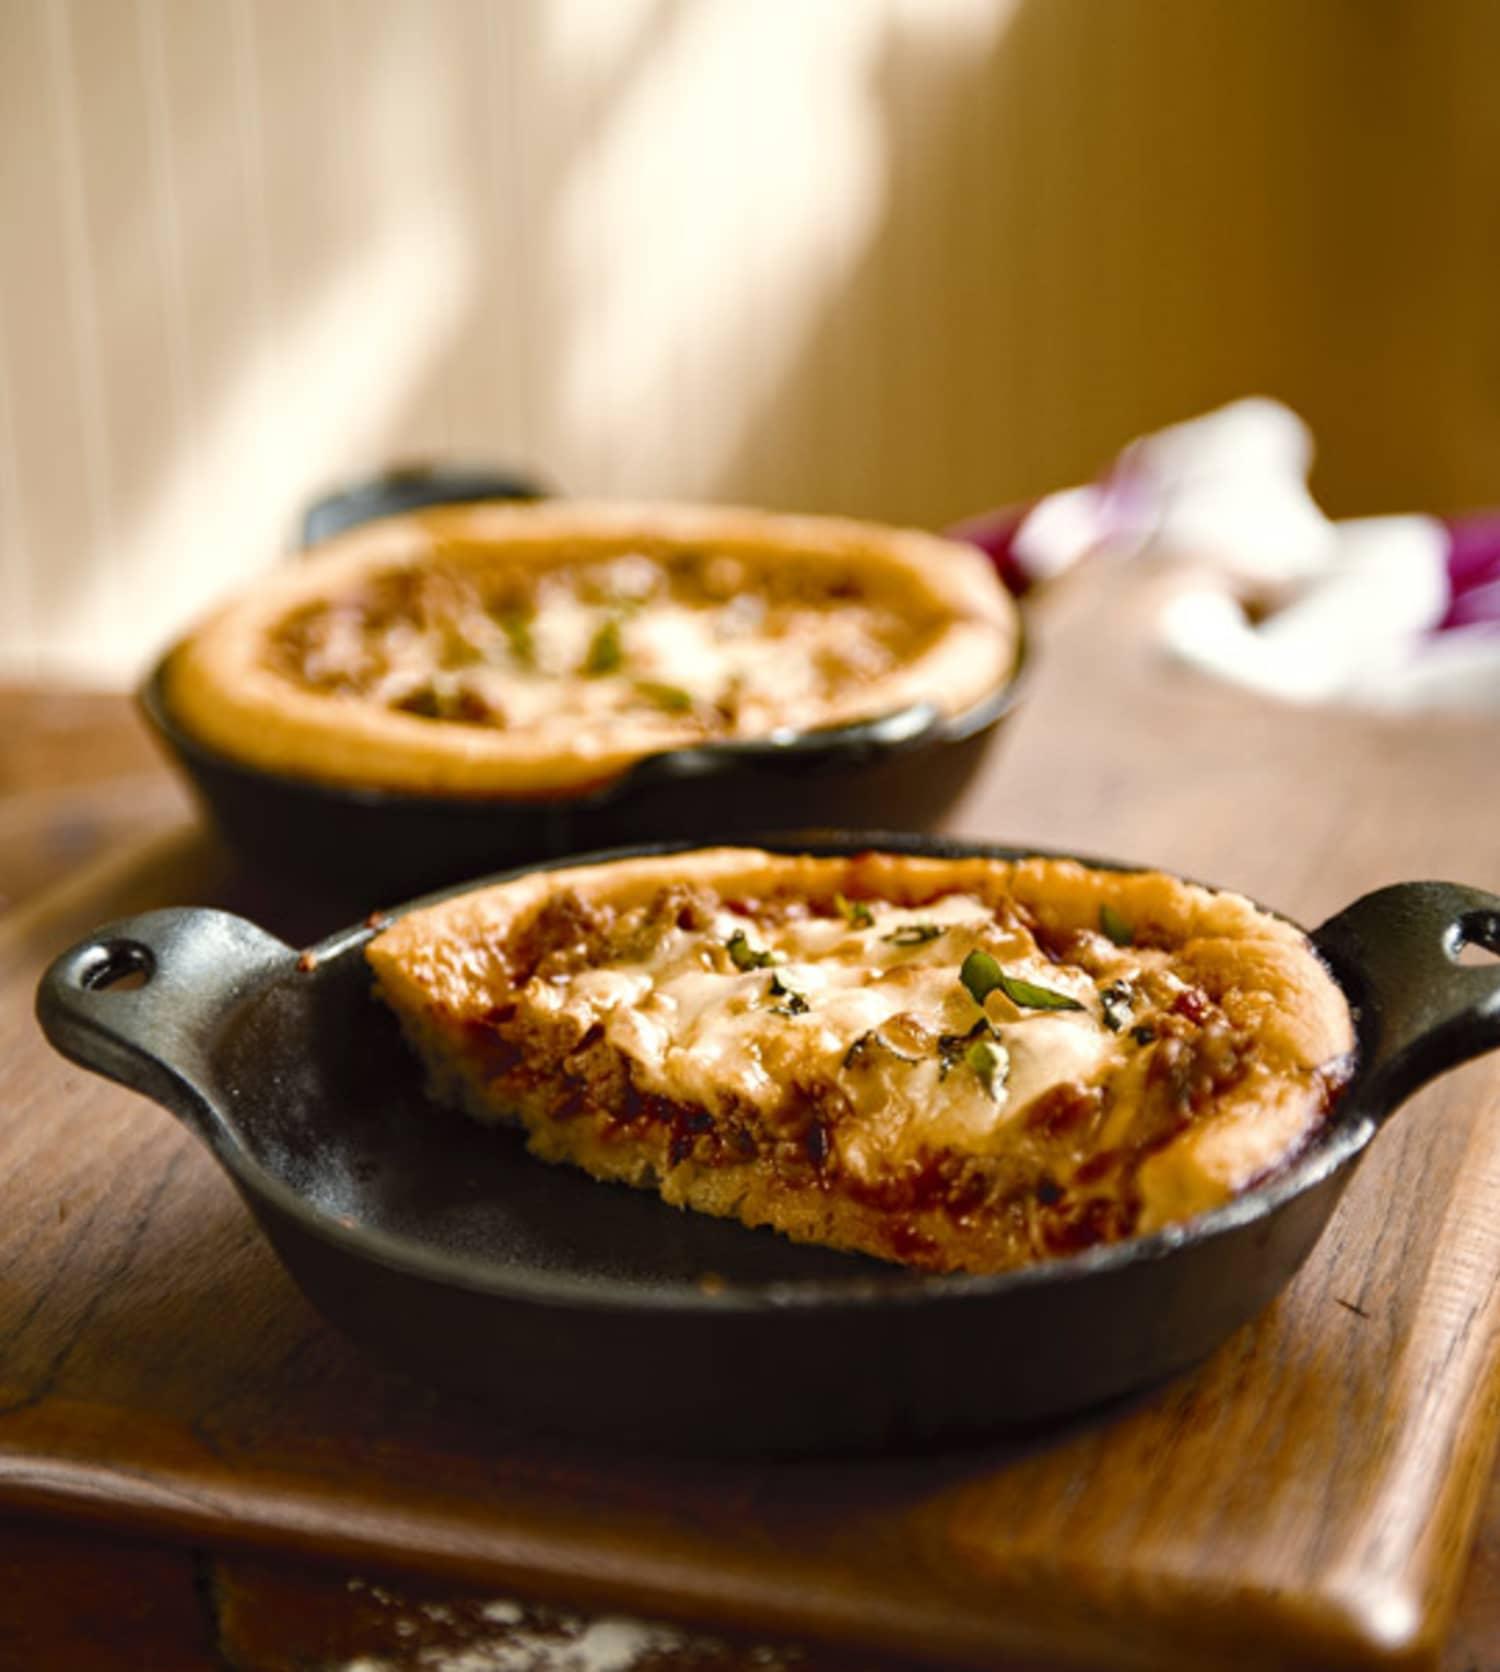 Artisan Pizza Kitchen: Chicago-Style Deep-Dish Pizza & No-Knead Cornmeal Crust